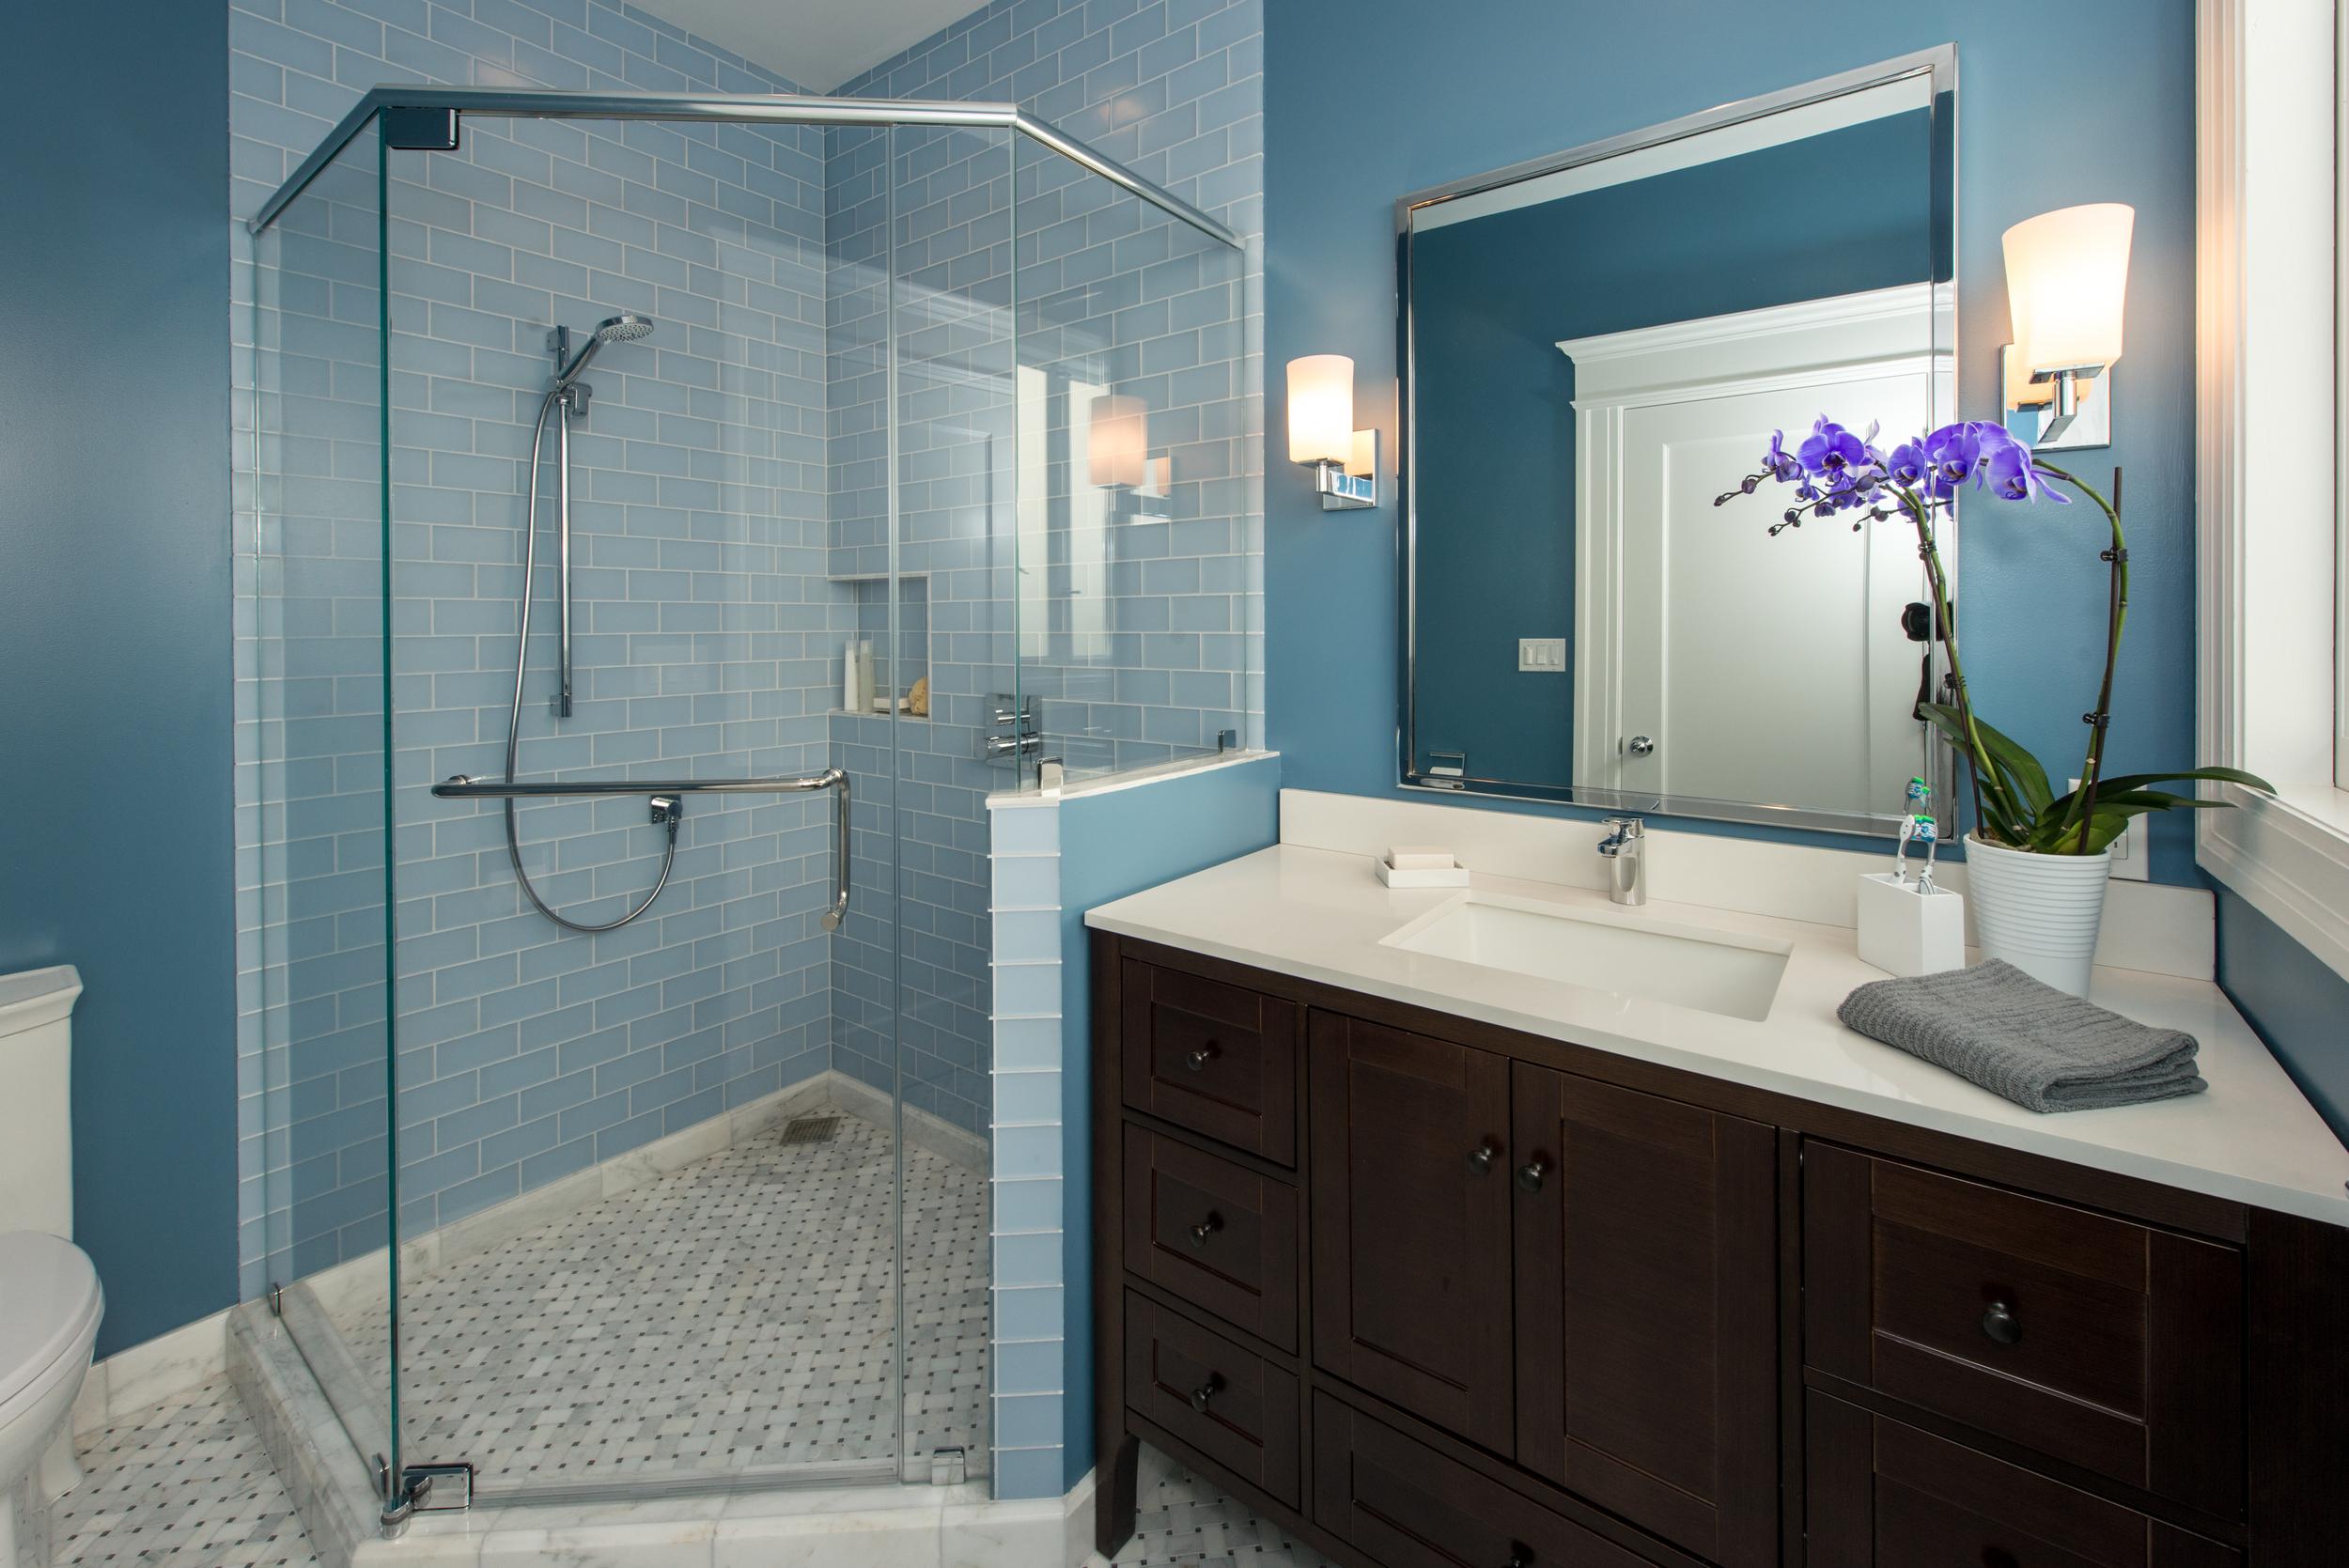 San Francisco Duboce Triangle Master Bathroom Design Set Match